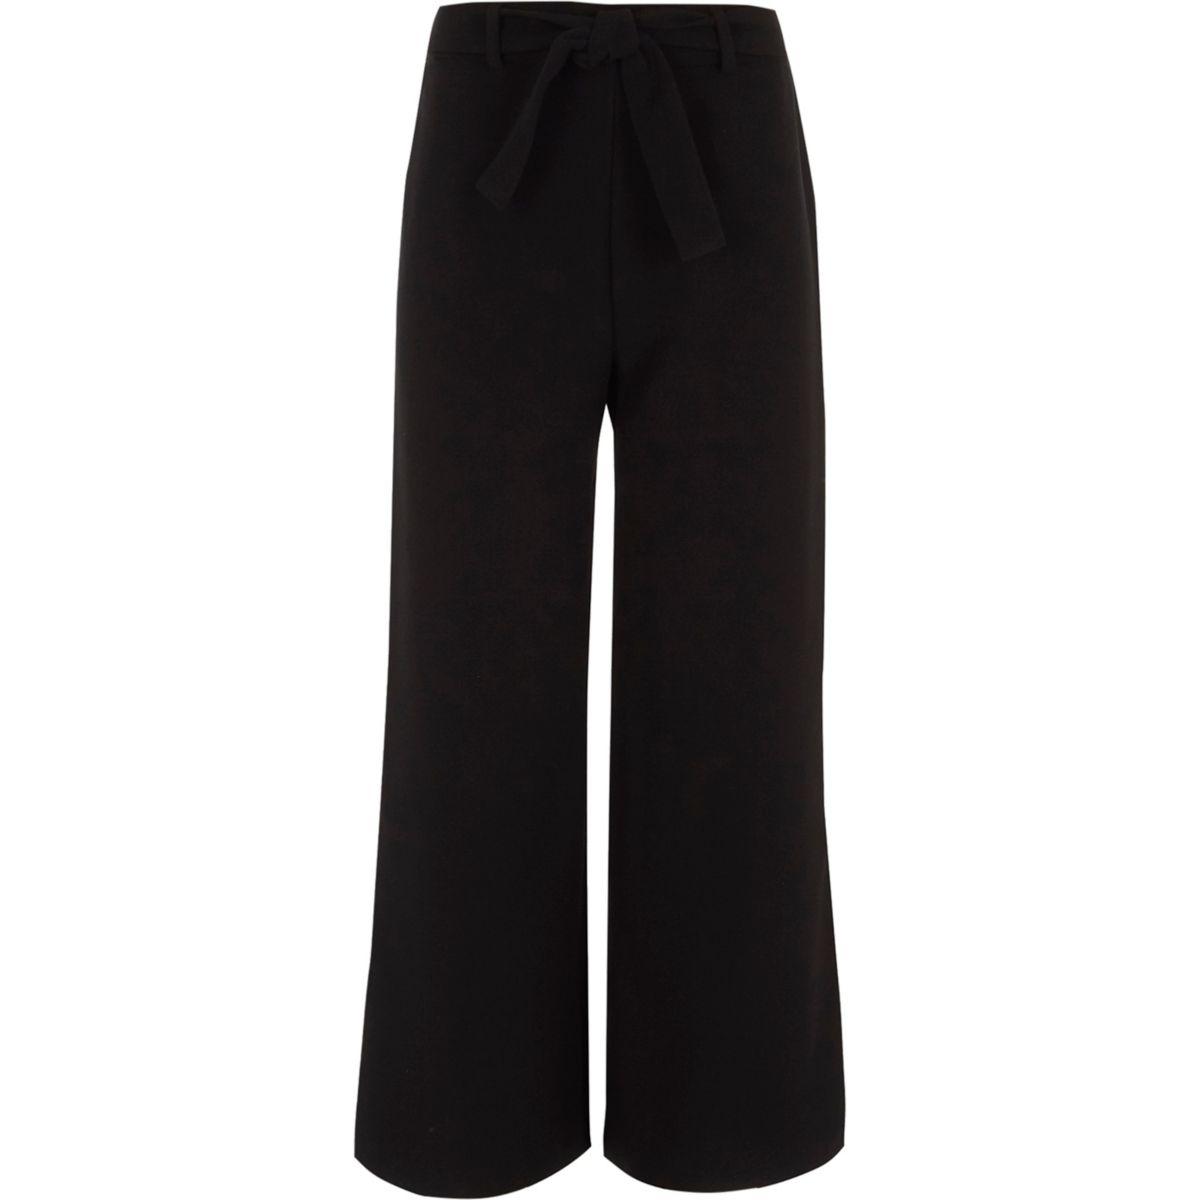 Girls black wide leg split palazzo trousers